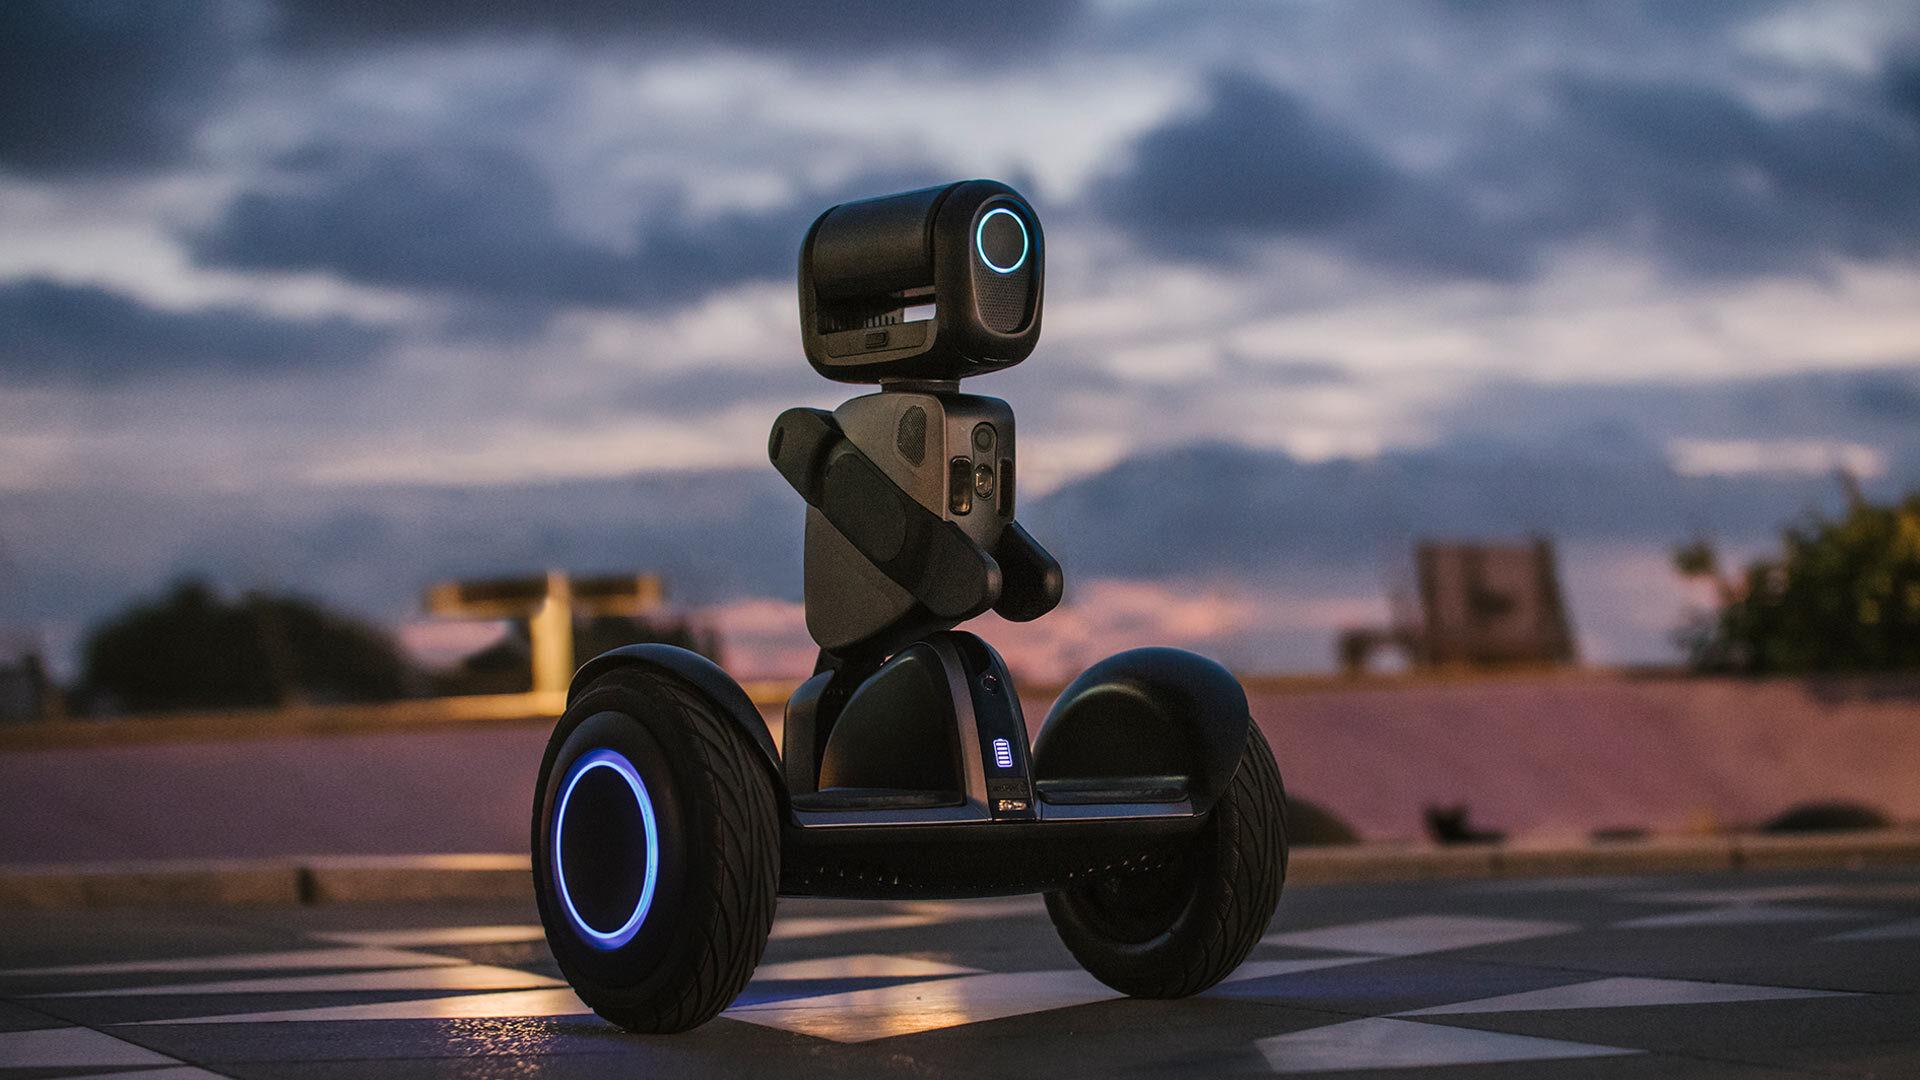 [hero] Segway Loomo Robot